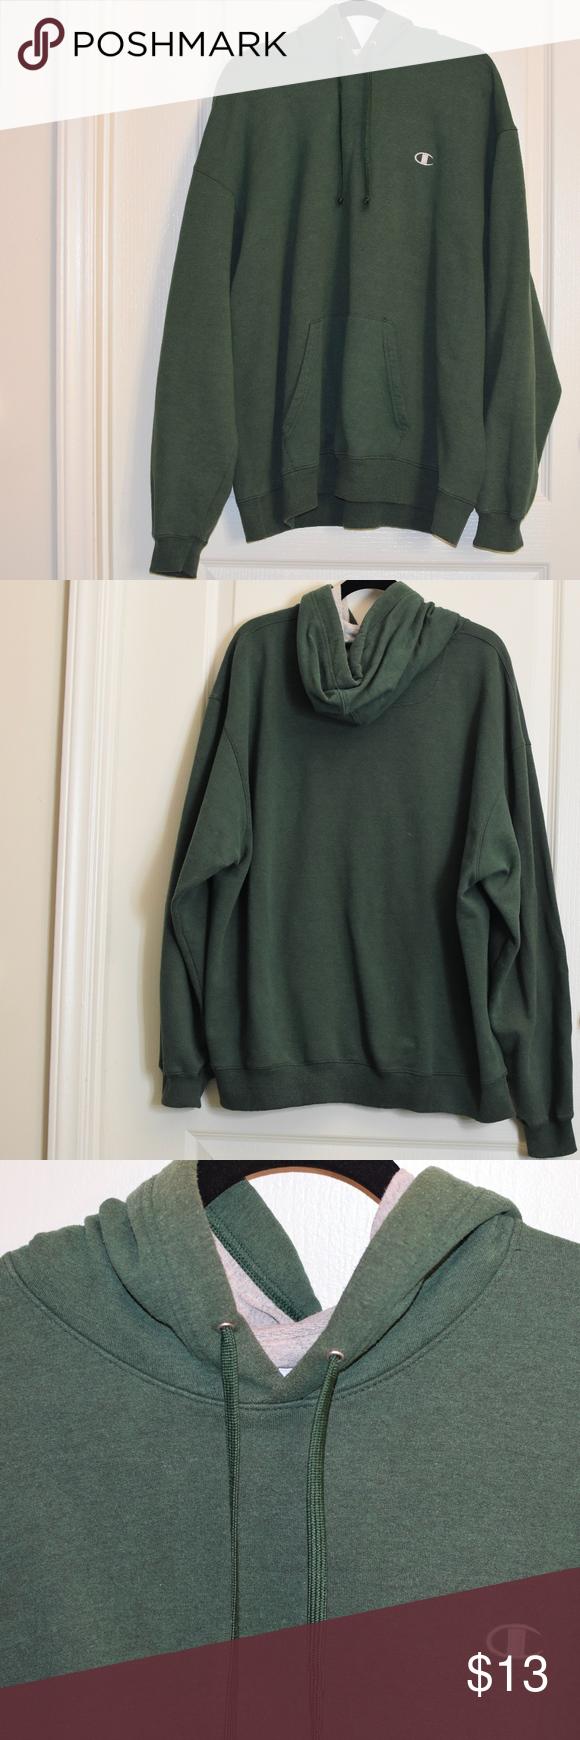 Champion Eco Authentic Hoodie Hoodies Sweatshirt Shirt Champion Shirts [ 1740 x 580 Pixel ]